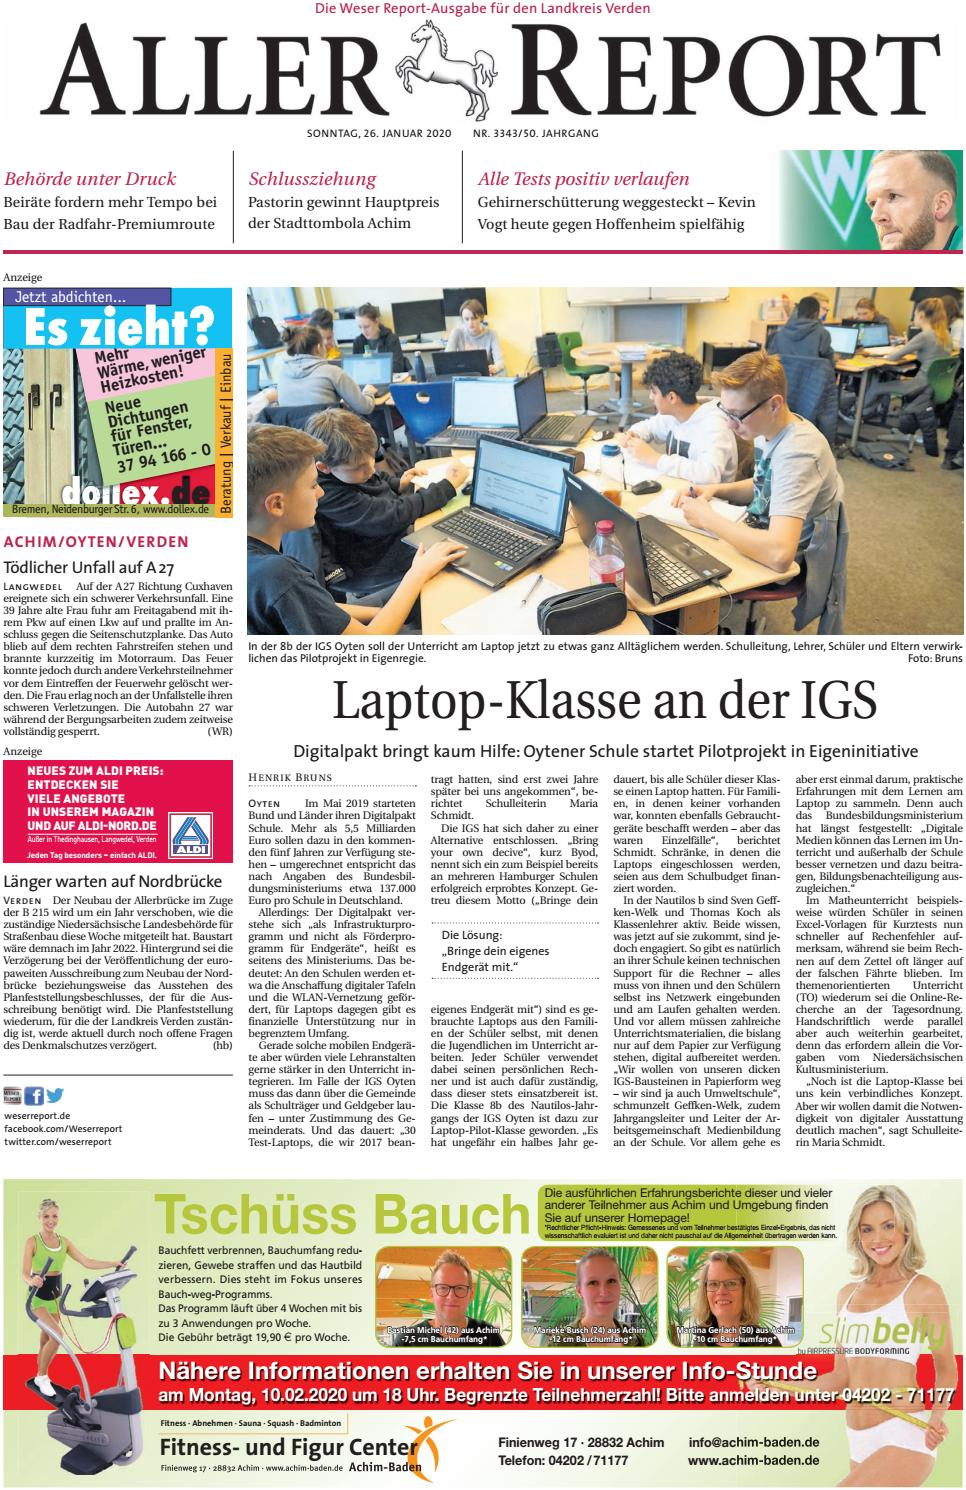 Aller Report vom 20.20.20 by KPS Verlagsgesellschaft mbH   issuu